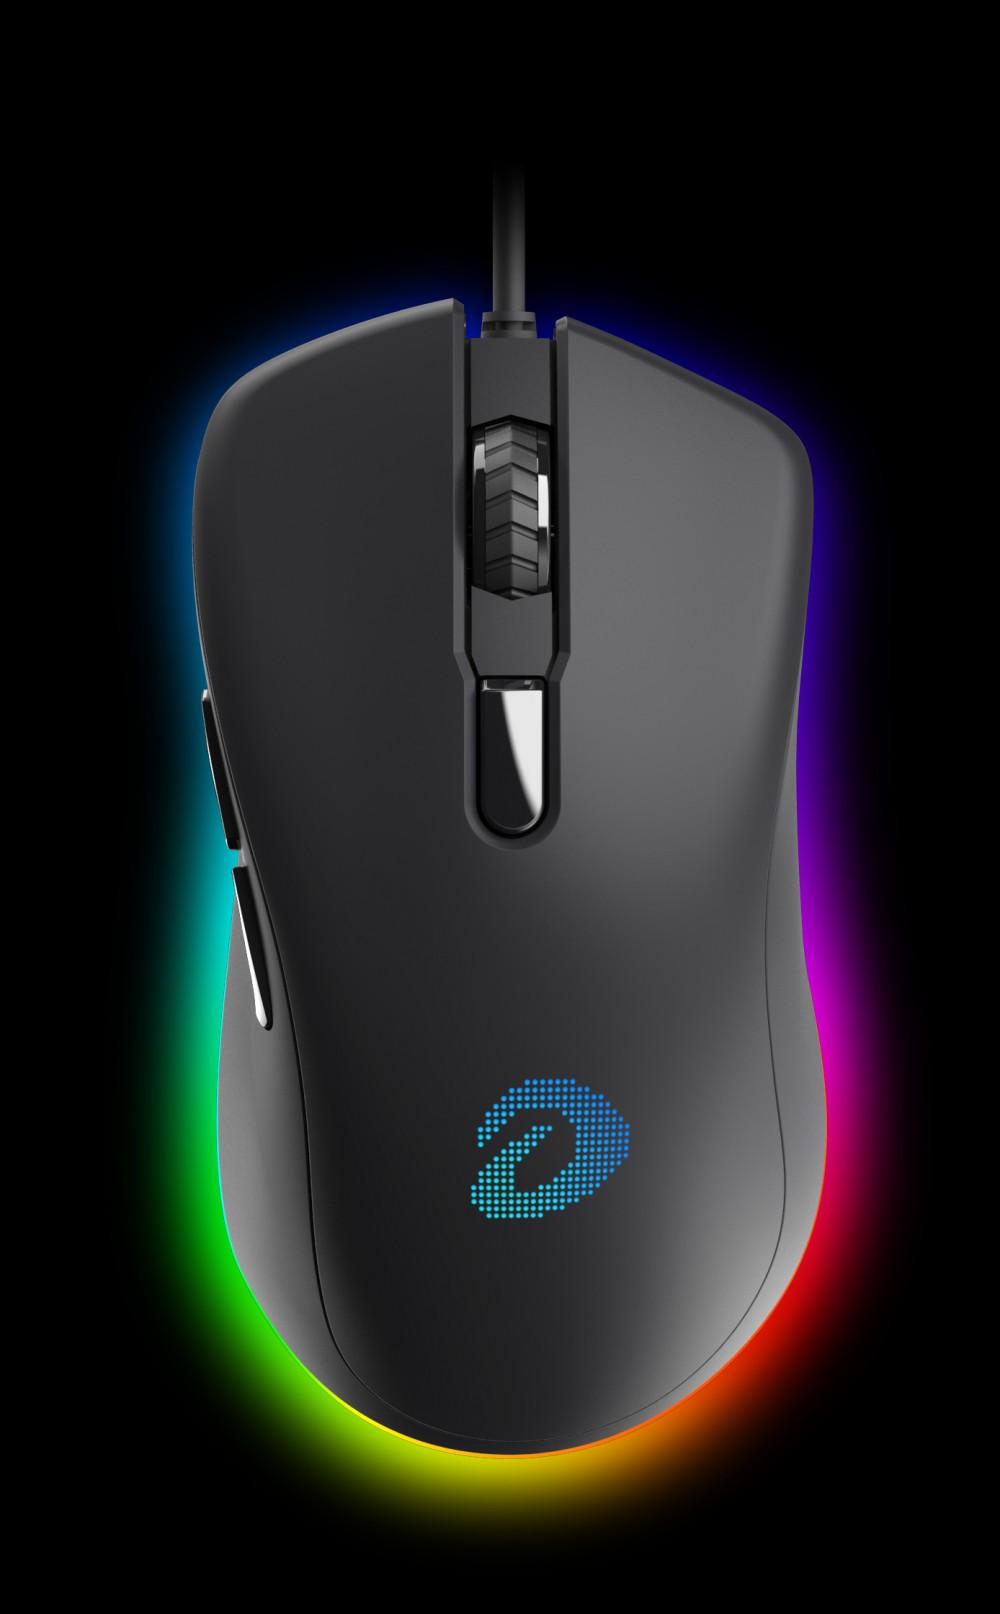 chuot-gaming-dareu-em908-led-rgb-bravo-sensor